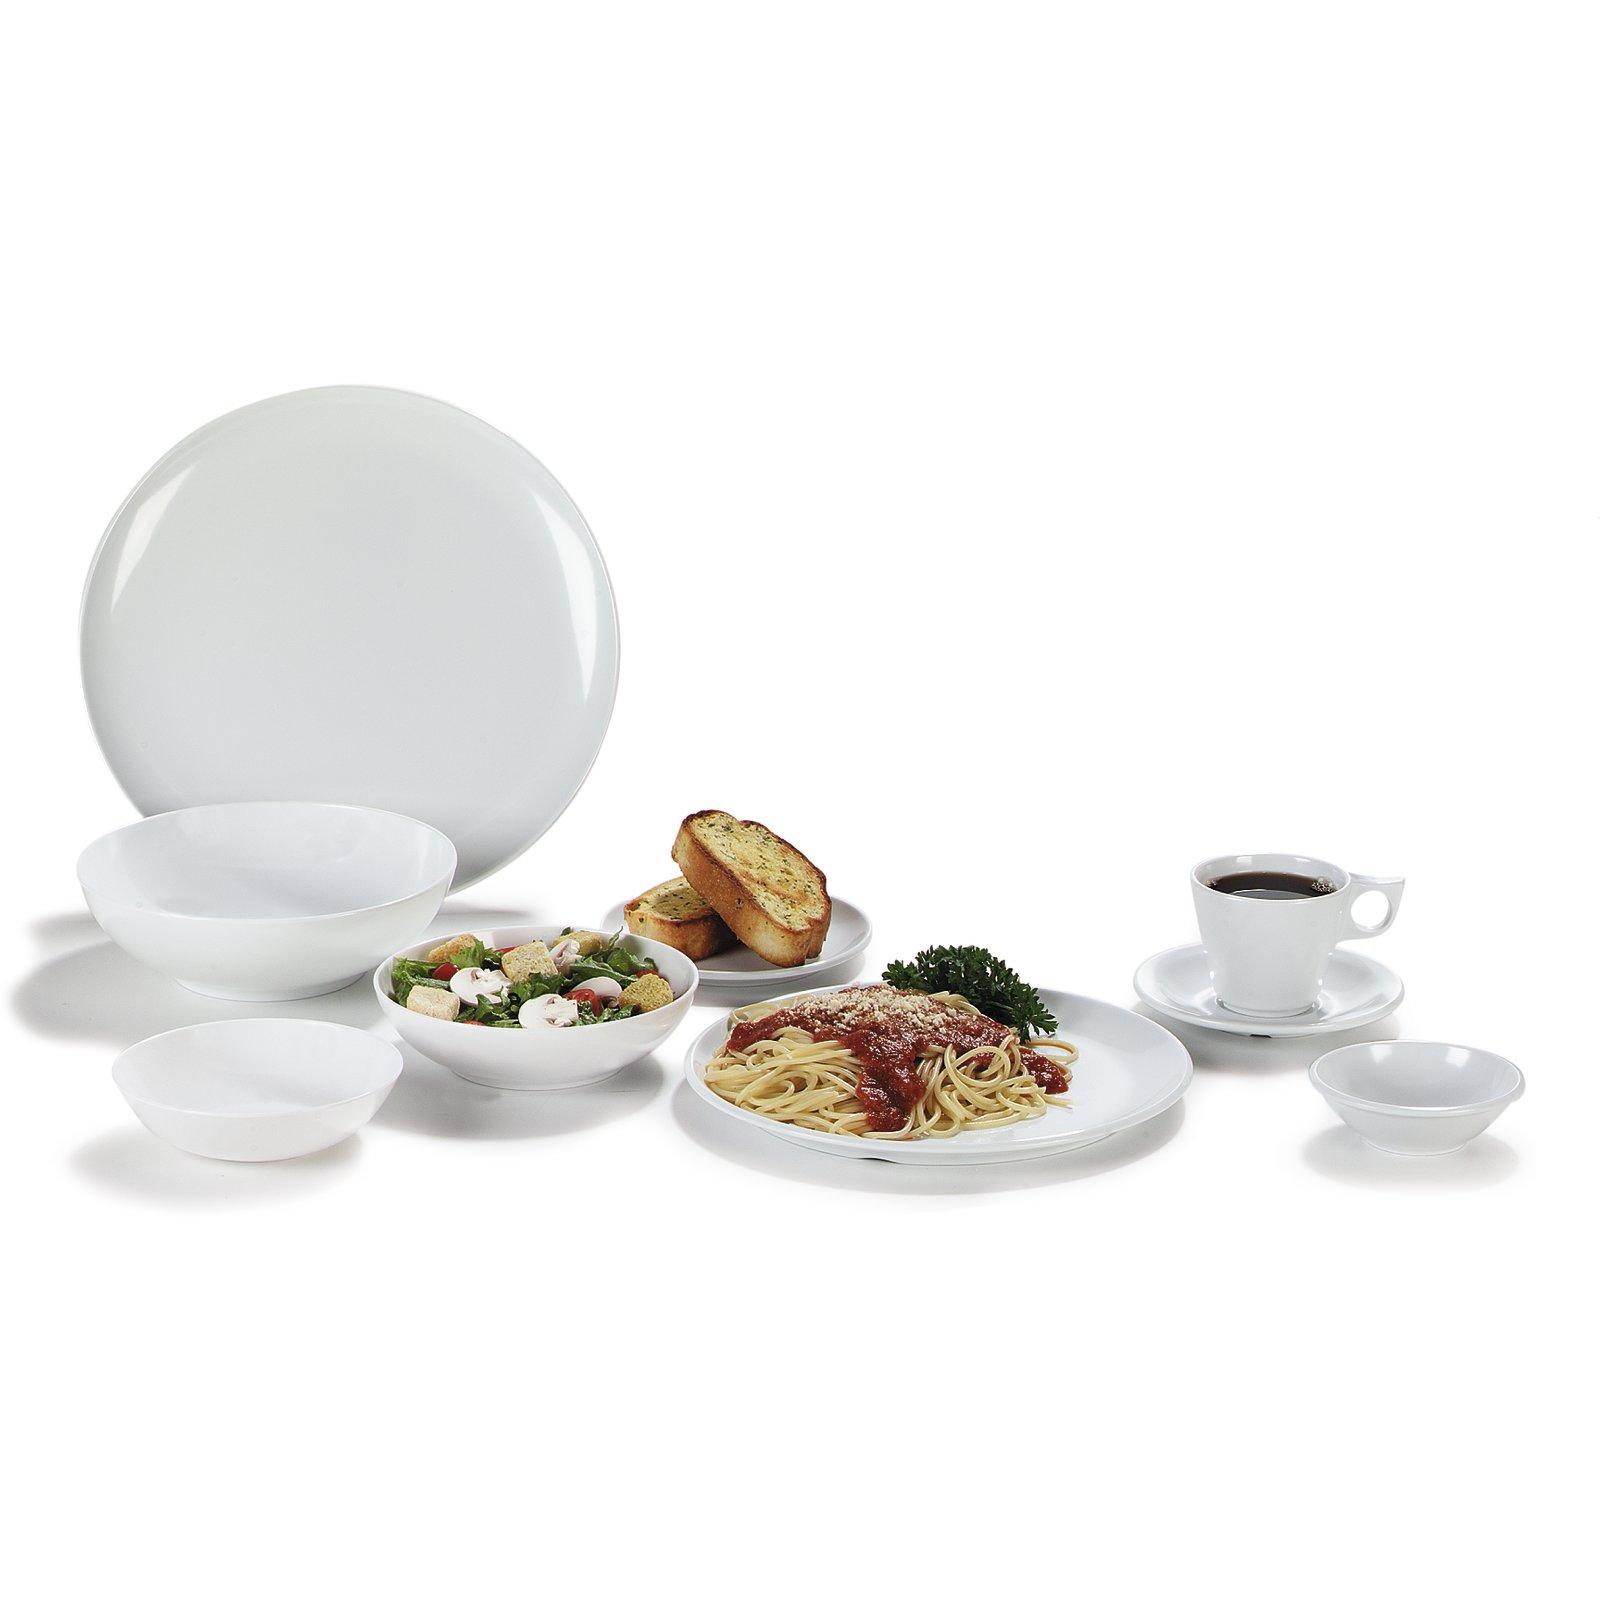 ... 4380002 - Epicure® Melamine Buffet Pizza Plate 12  - White  sc 1 st  Carlisle FoodService Products & 4380002 - Epicure® Melamine Buffet Pizza Plate 12